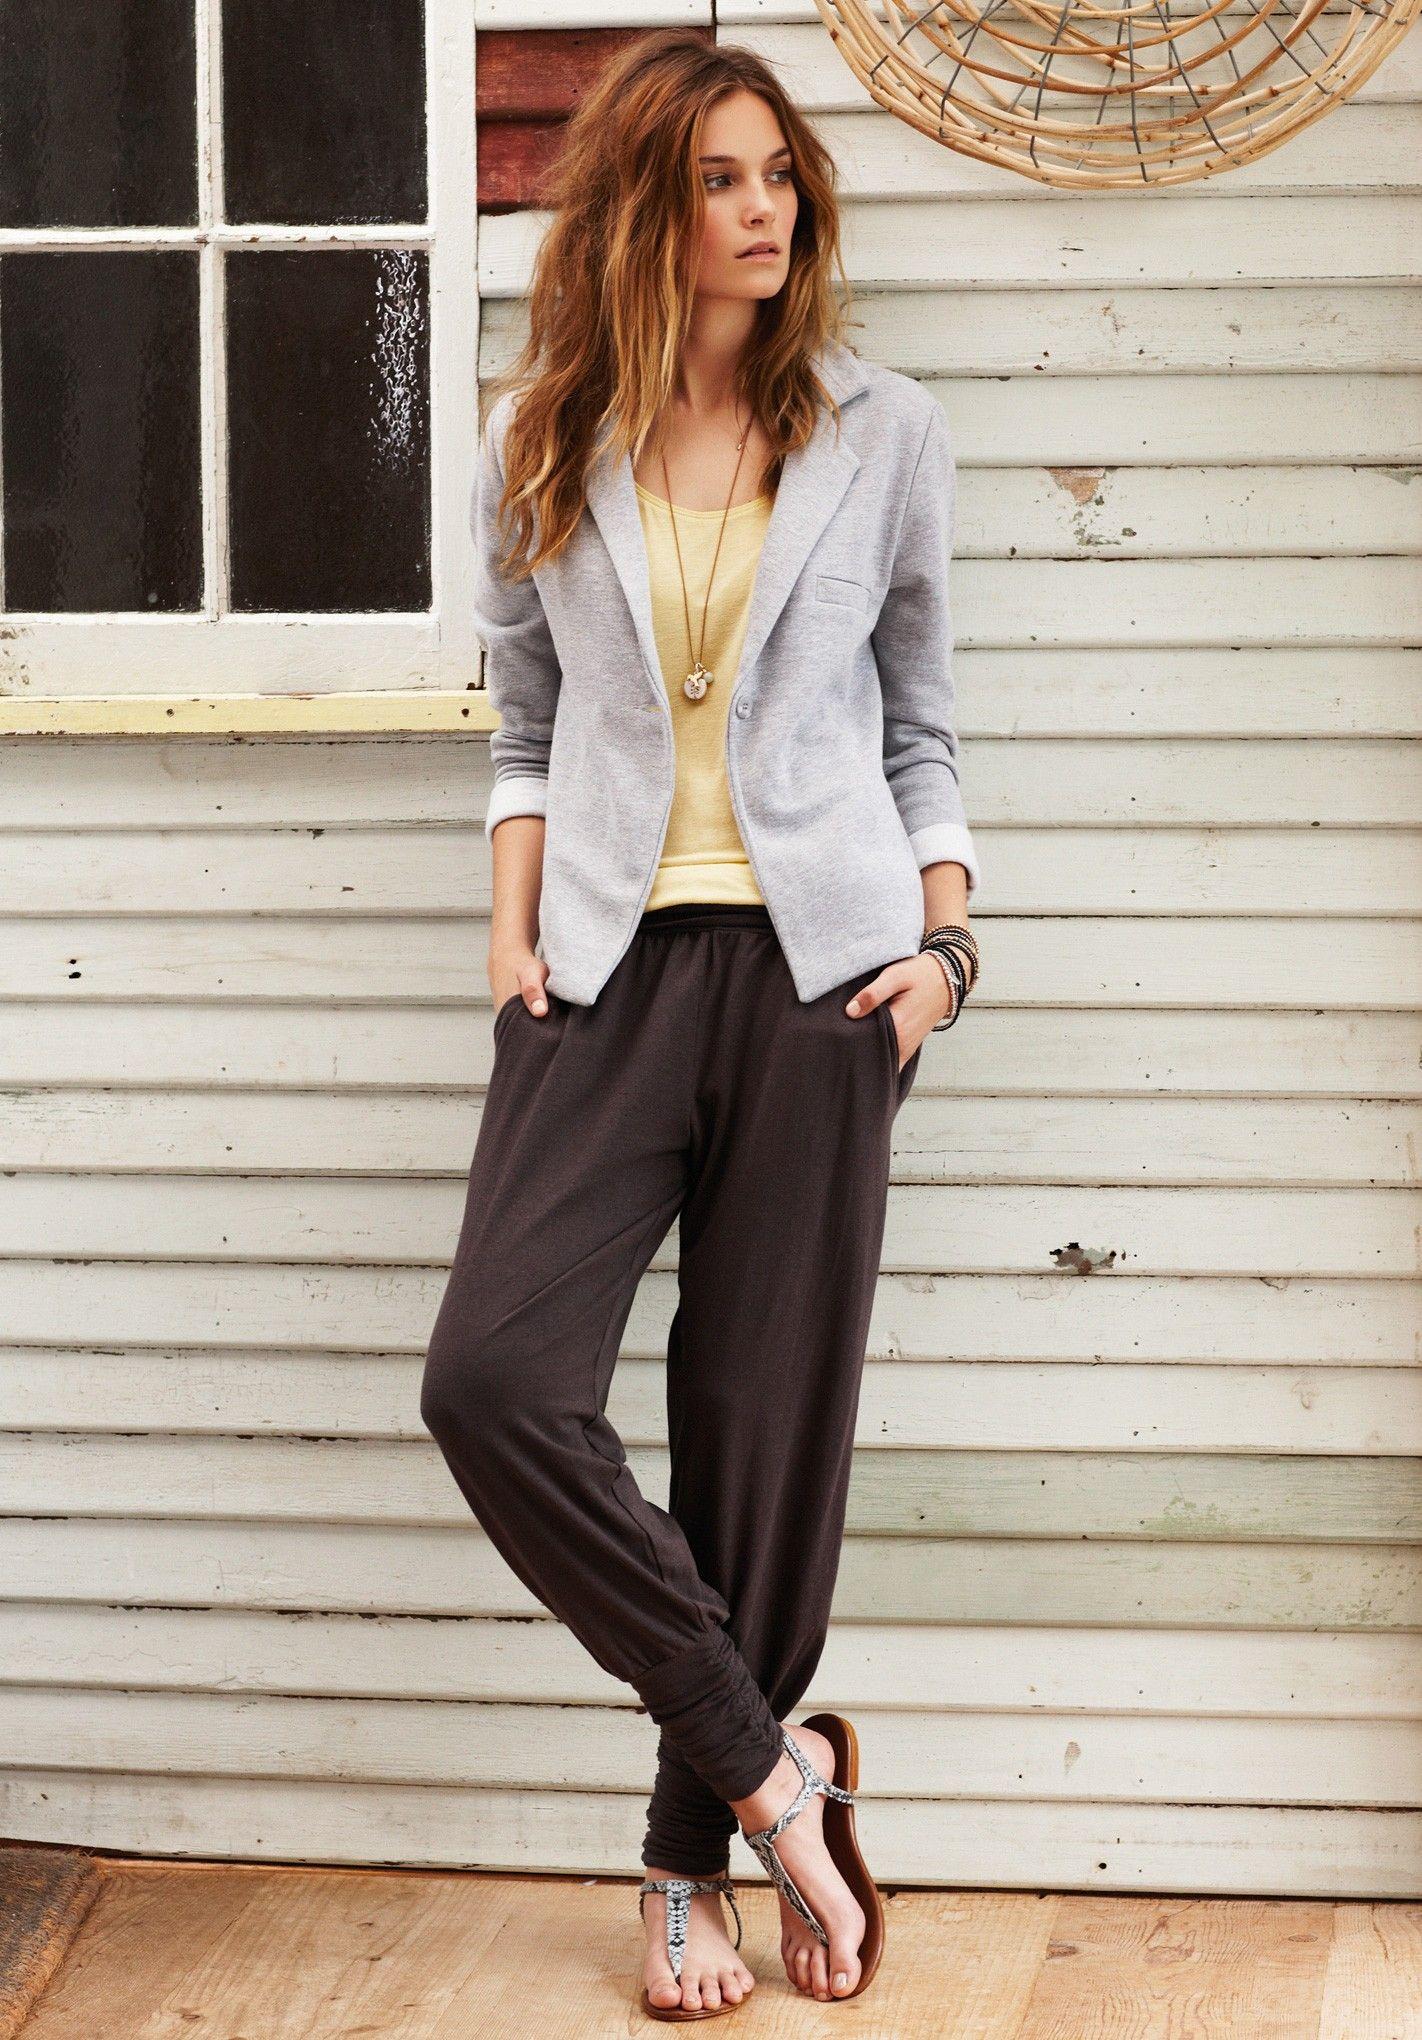 Charcoal Marl Long Harem Trousers | Trousers & Leggings | hush | hush-uk.com Love her jacket! So cute.